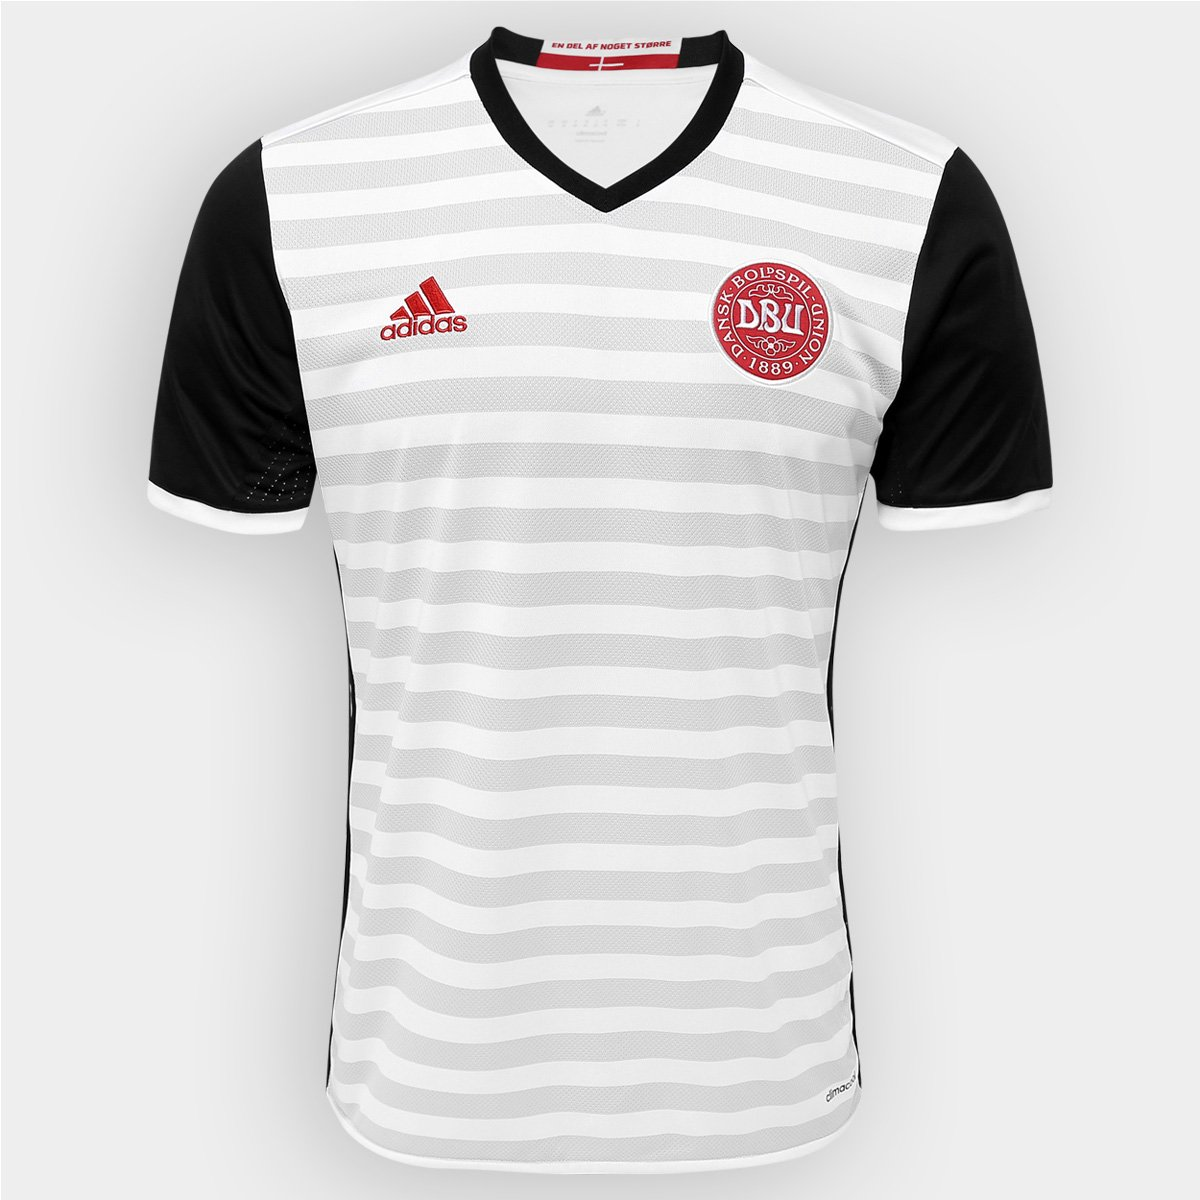 Camisa Seleção Dinamarca Away 2016 s nº Torcedor Adidas Masculina - Compre  Agora  b737c4af6ffc0